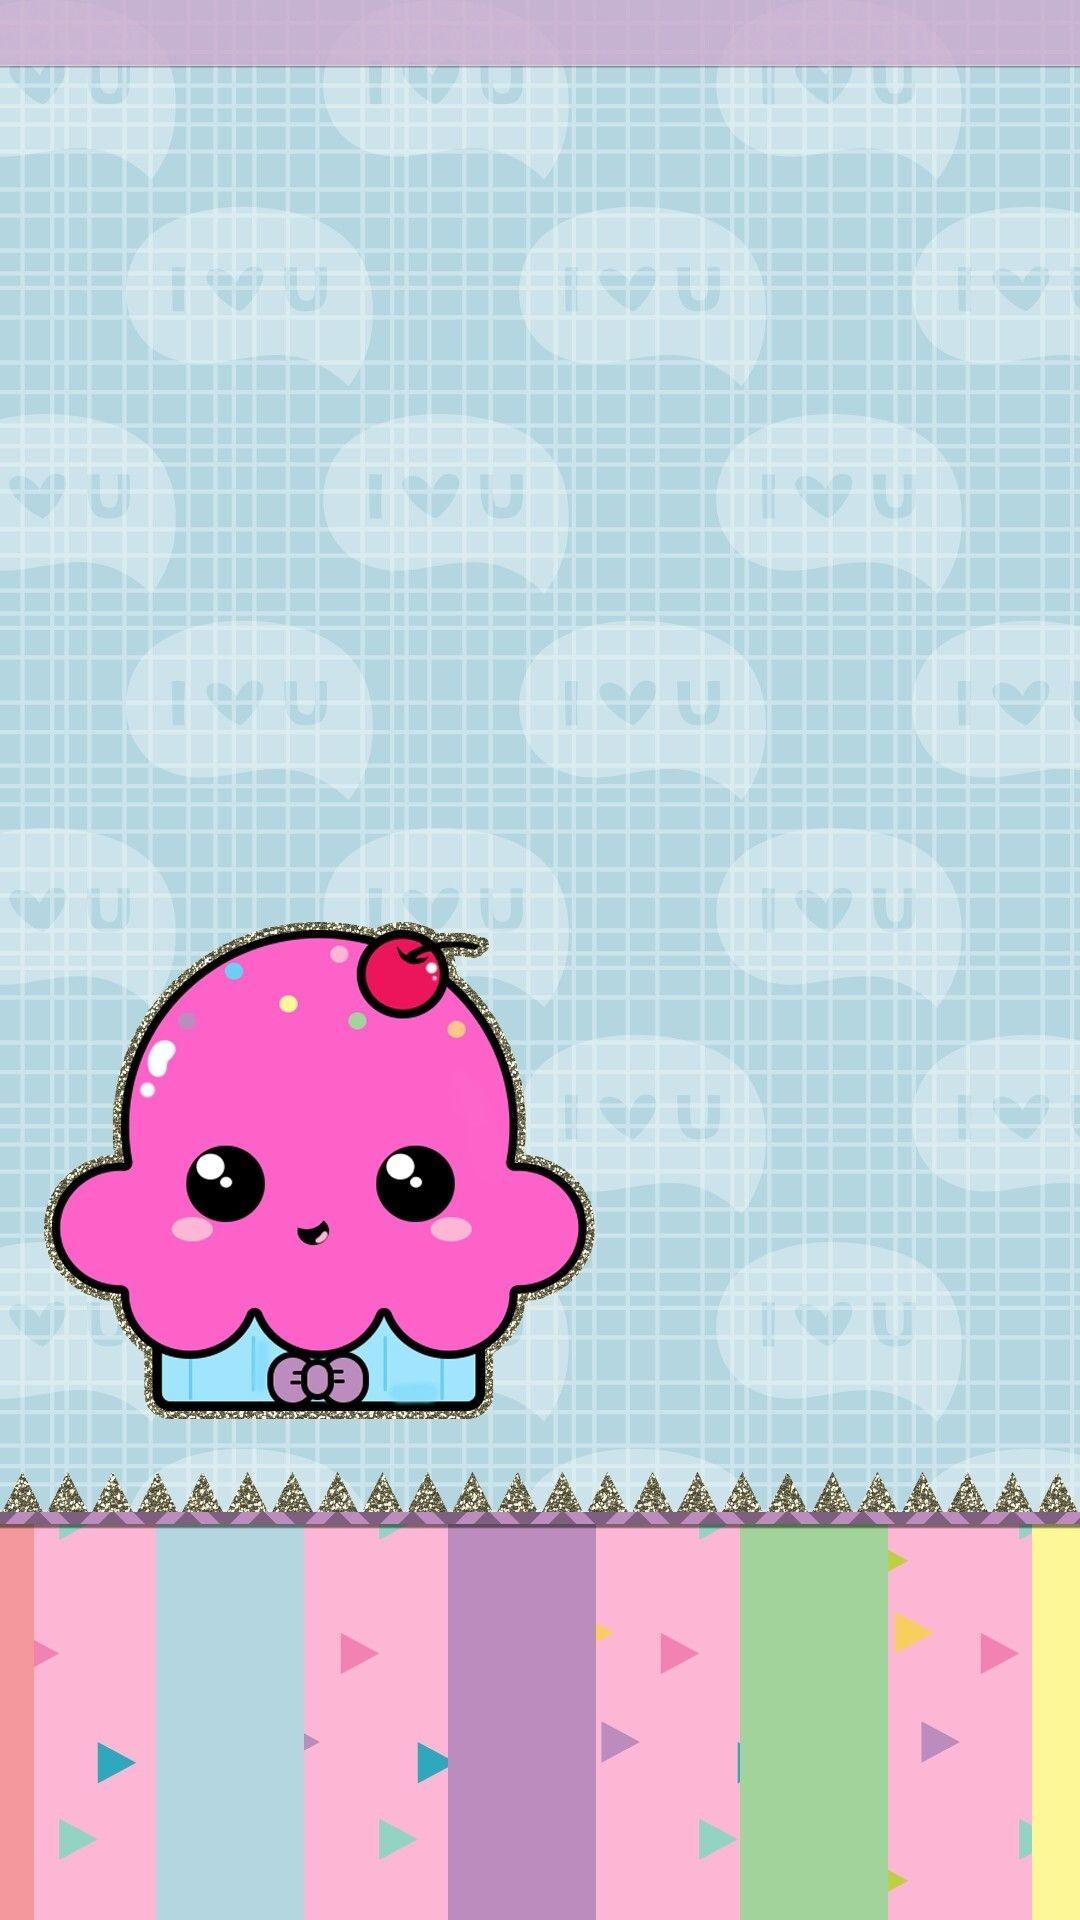 Res: 1080x1920, Cute Wallpapers, Wallpaper Backgrounds, Iphone Wallpapers, Baby Girl  Photos, Comfort Foods, Kawaii Anime, Kandi, Phones, Wallpapers